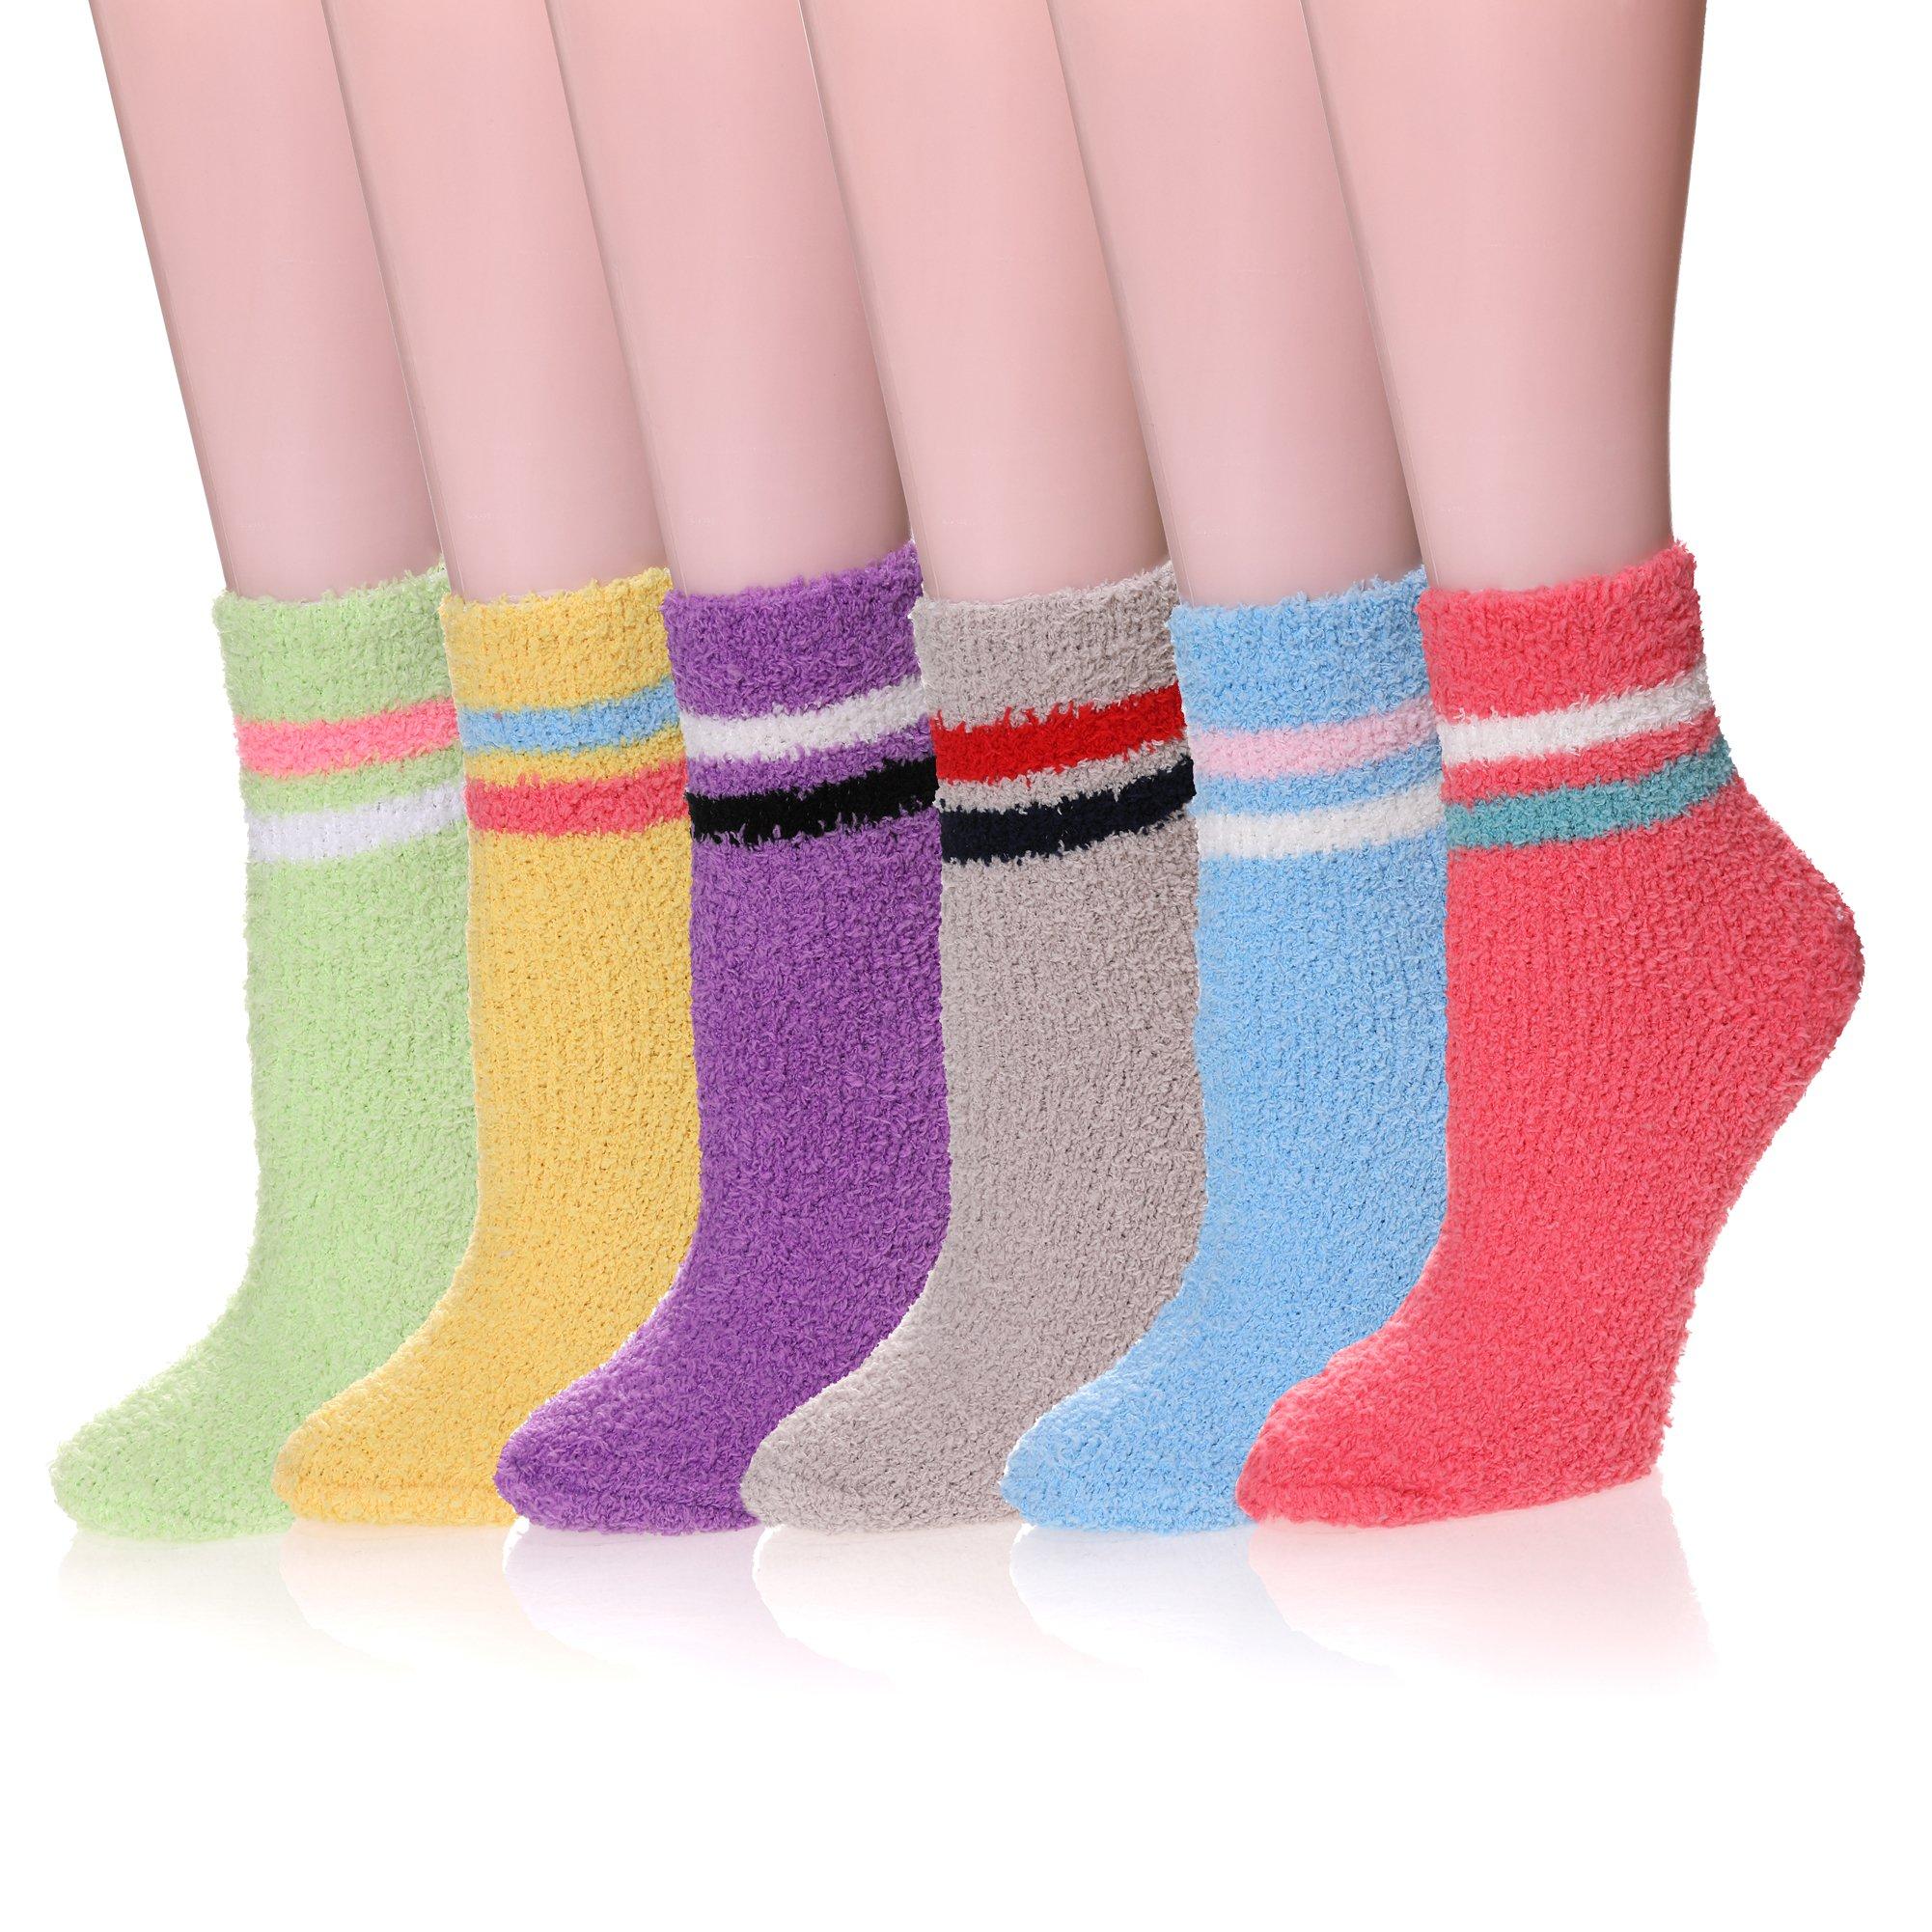 LINEMIN 6 Pack Women Cozy Fuzzy Slipper Crew Socks Super Soft Warm Home Sleeping Socks (6 Pack Stripe)